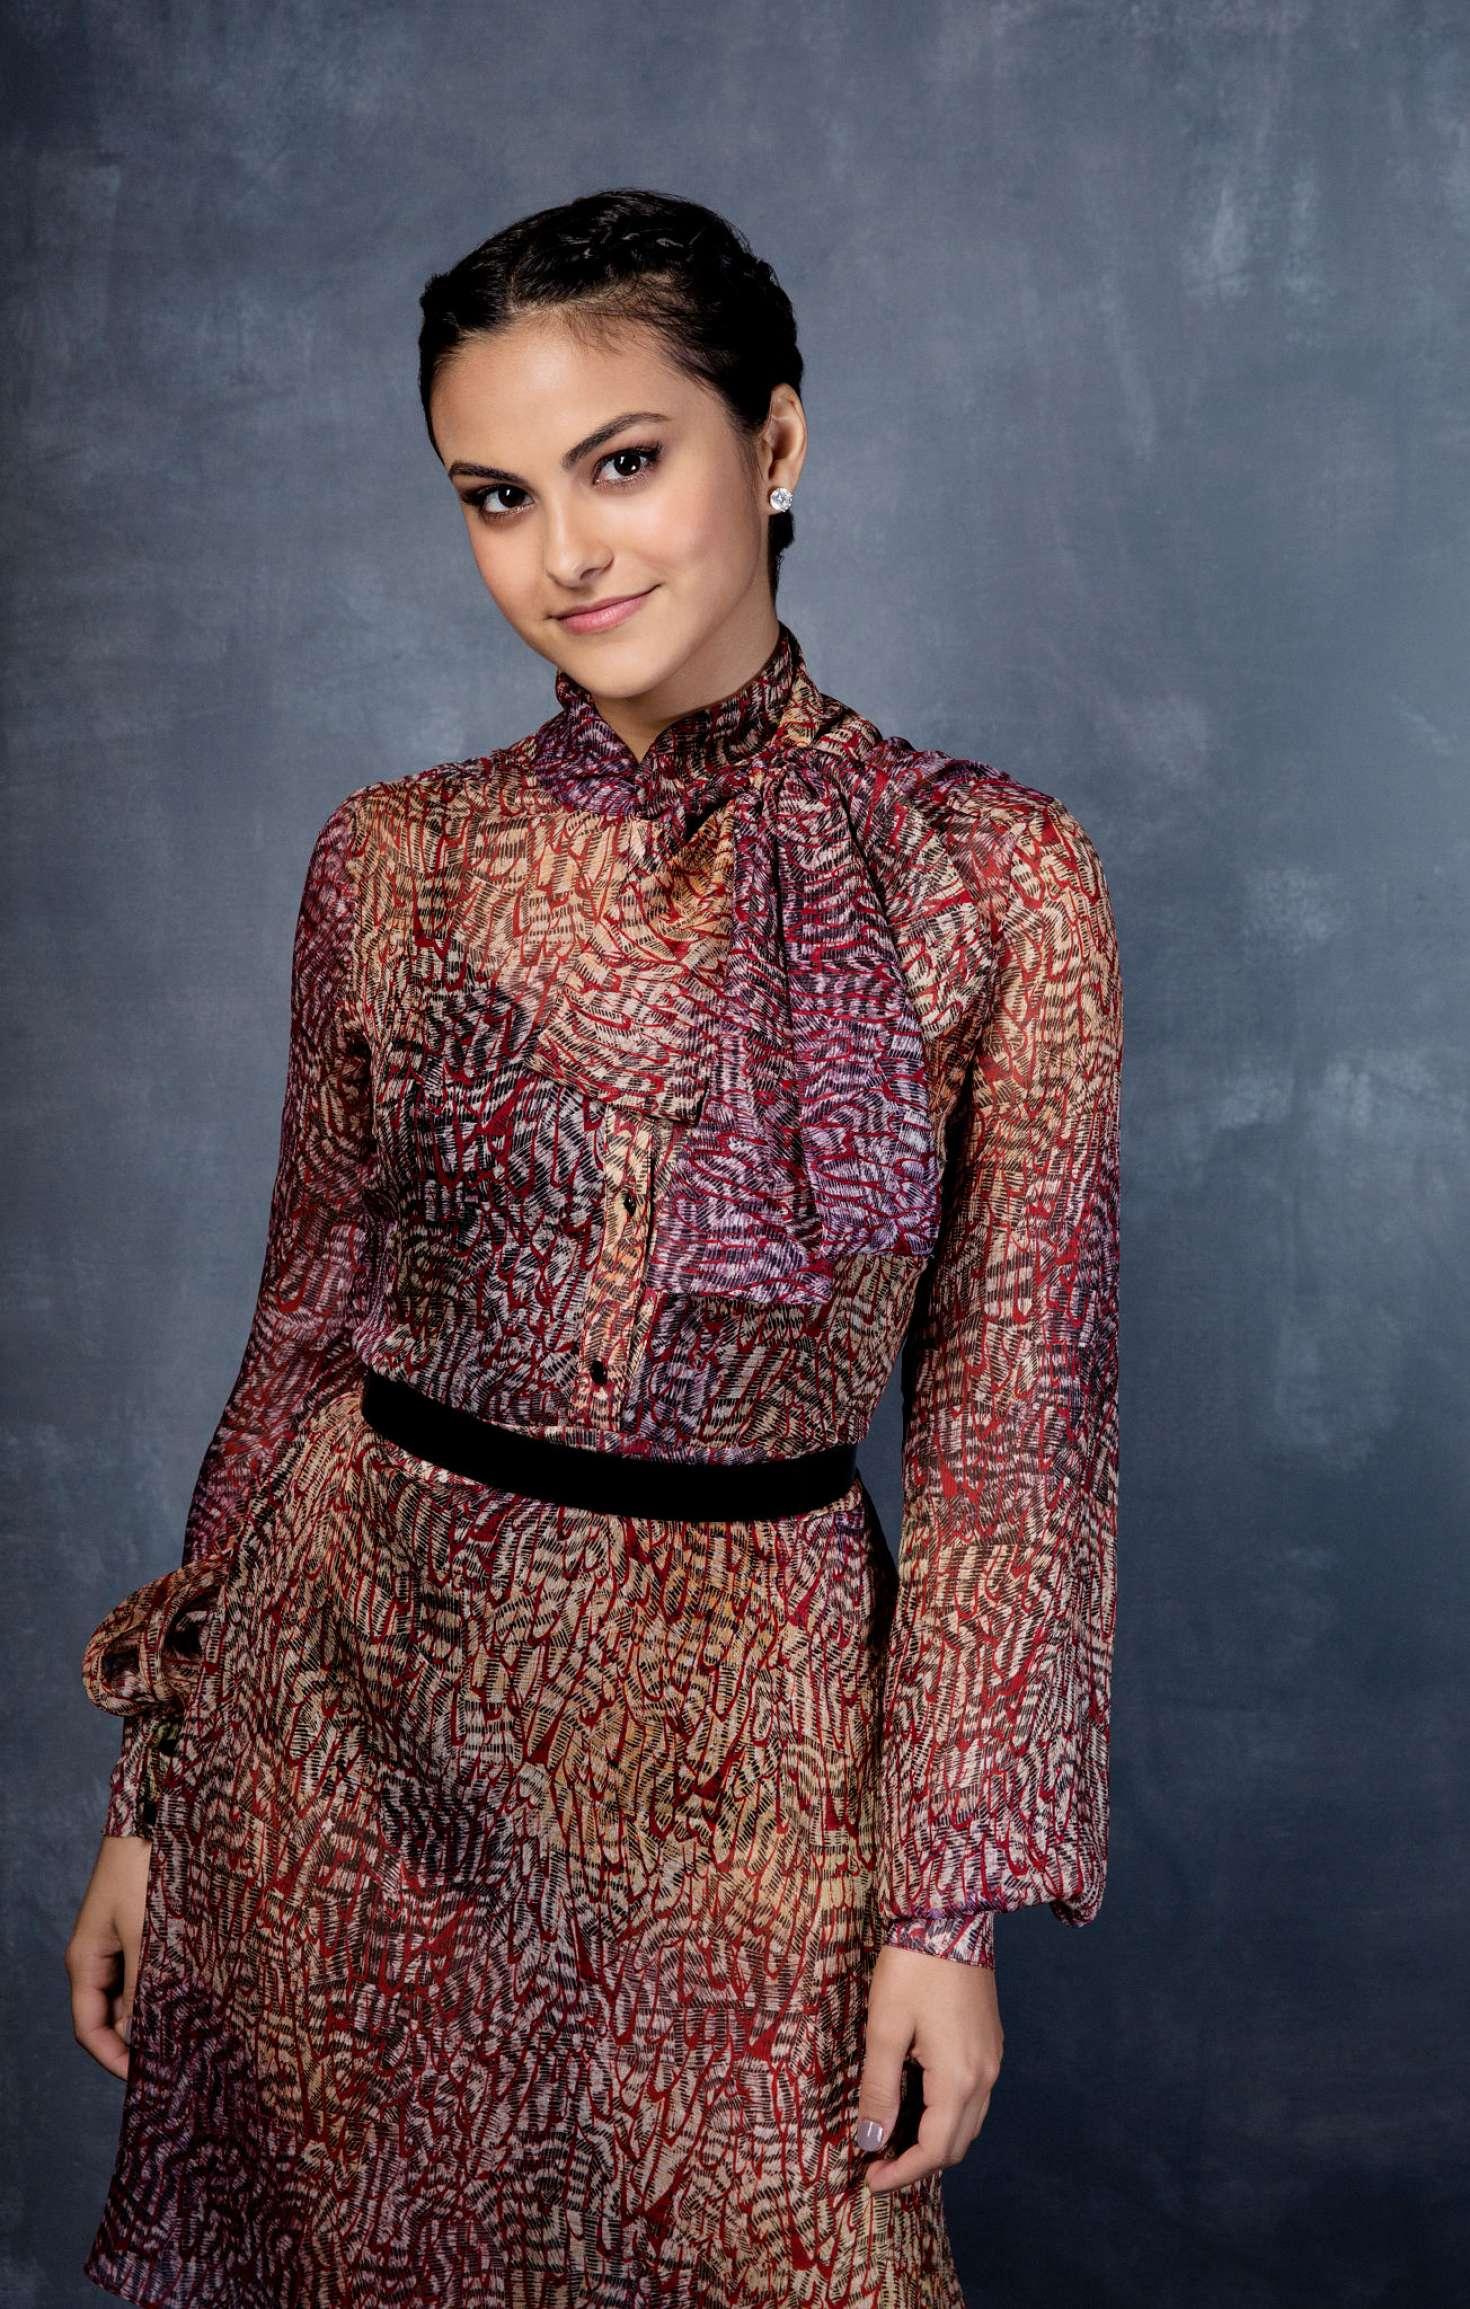 Camila Mendes - Los Angeles Times Comic-Con Portraits by ... Vanessa Hudgens Boyfriend